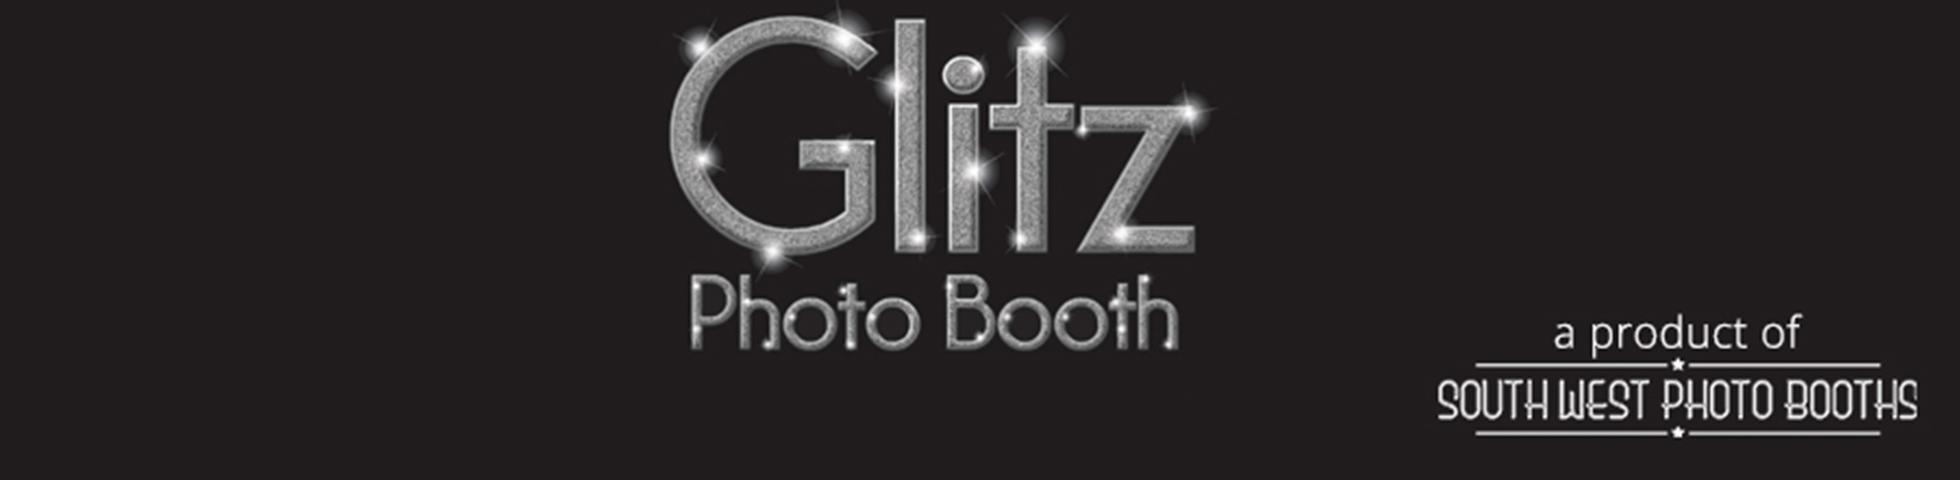 Glitz Photo Booth